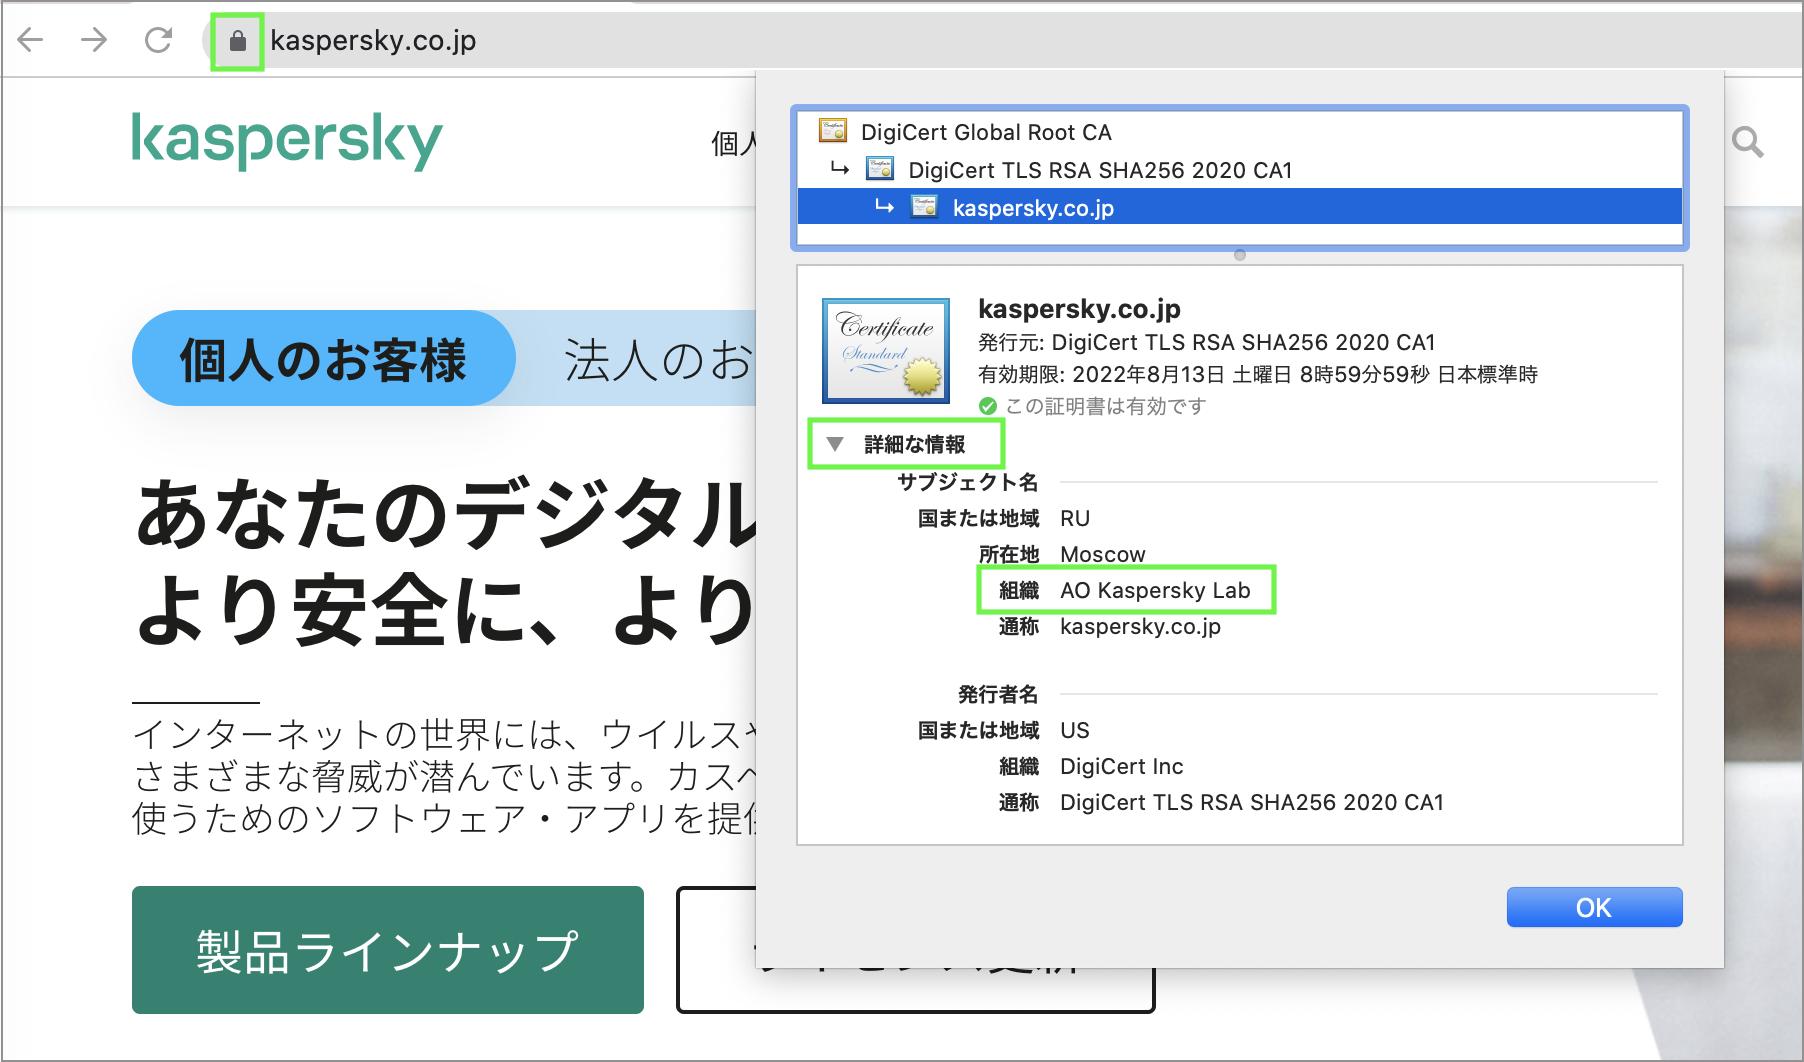 Google Chromeで当社Webサイトにアクセスしたときの表示